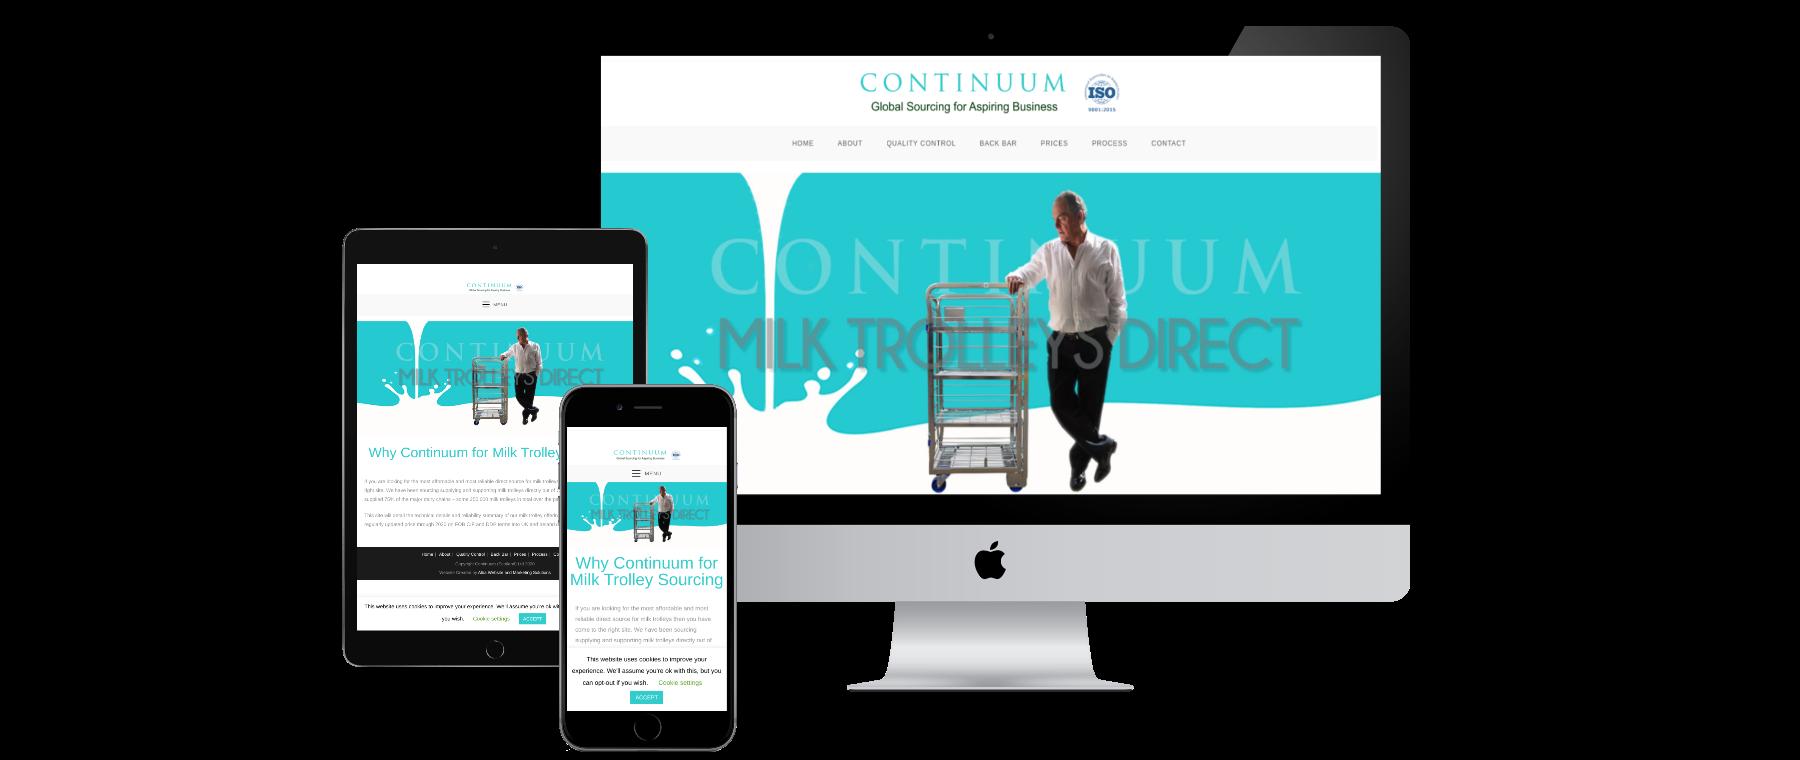 Milk trolleys Direct - Website Designed by Alba Digital Solutons